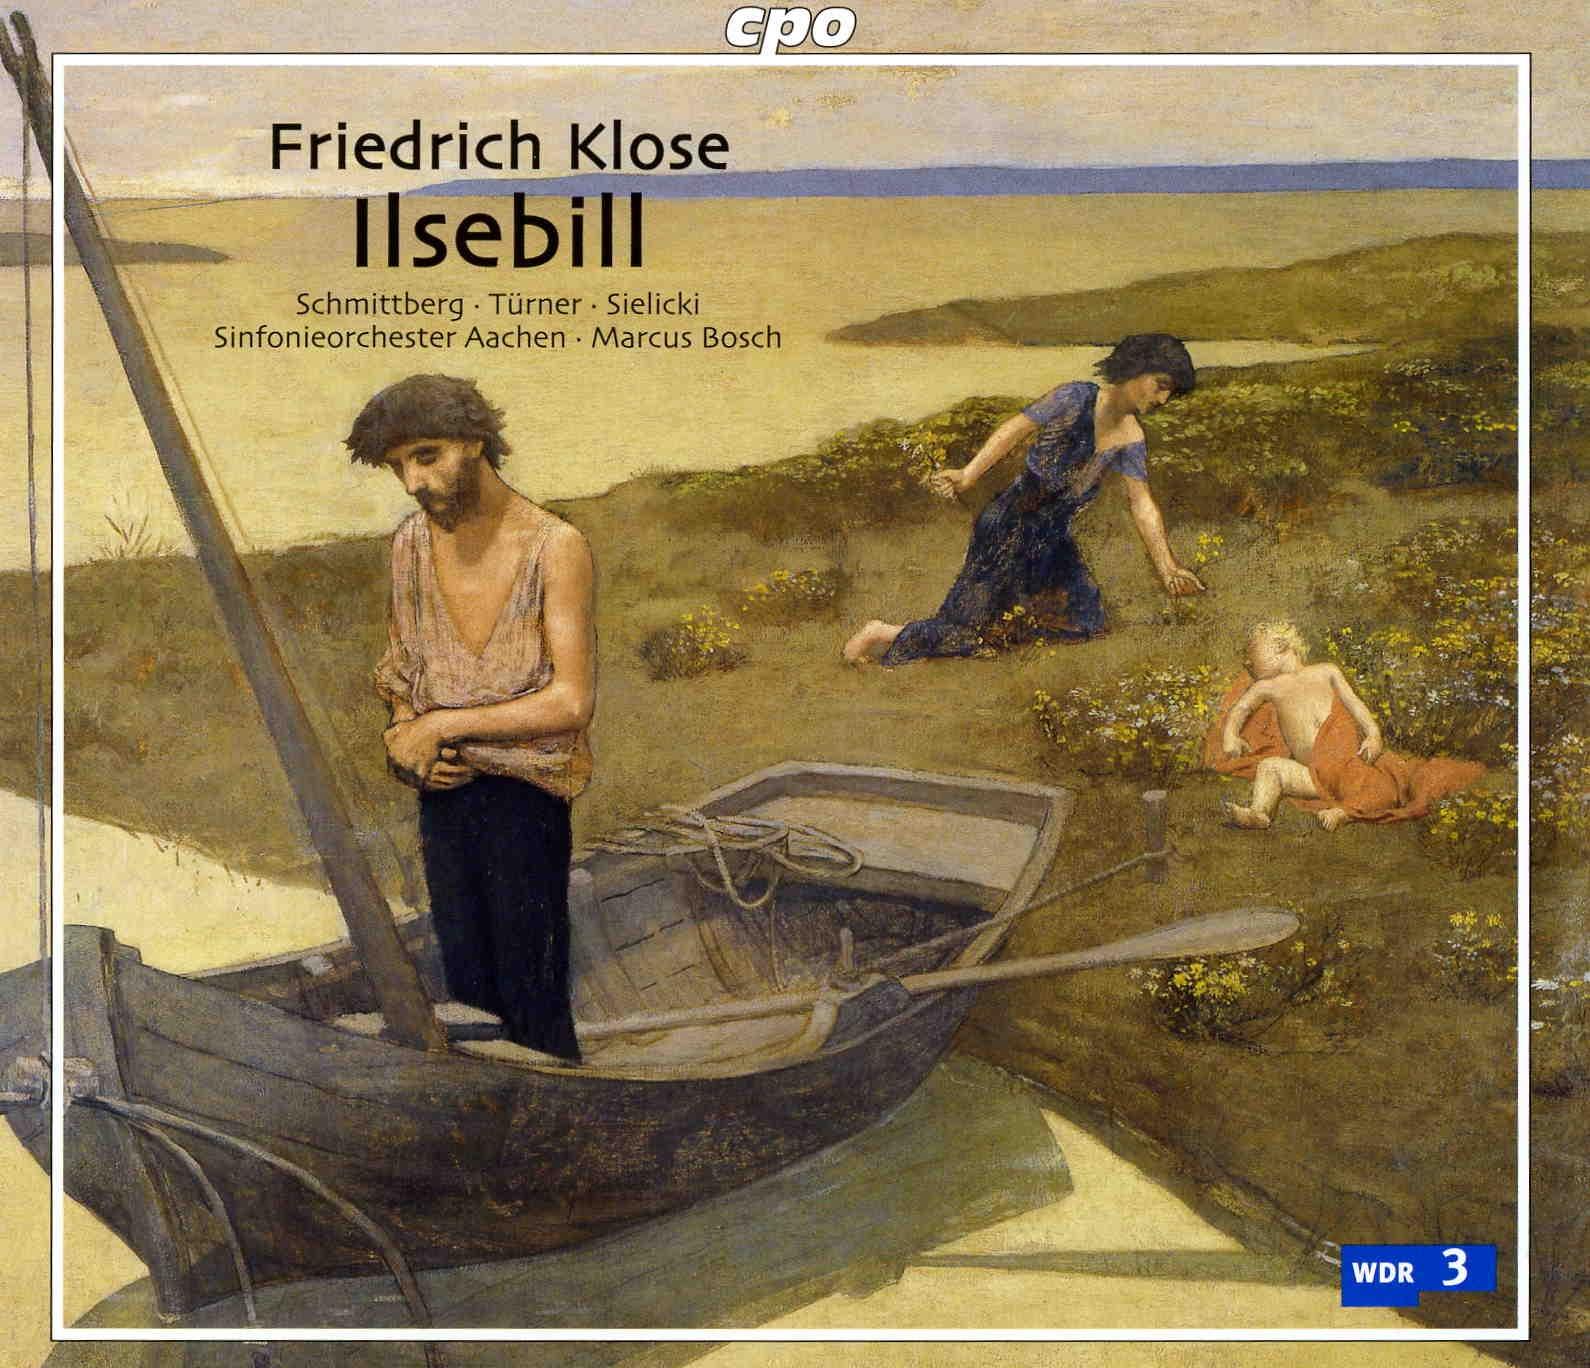 Friedrich_Klose_Ilsebill.JPG